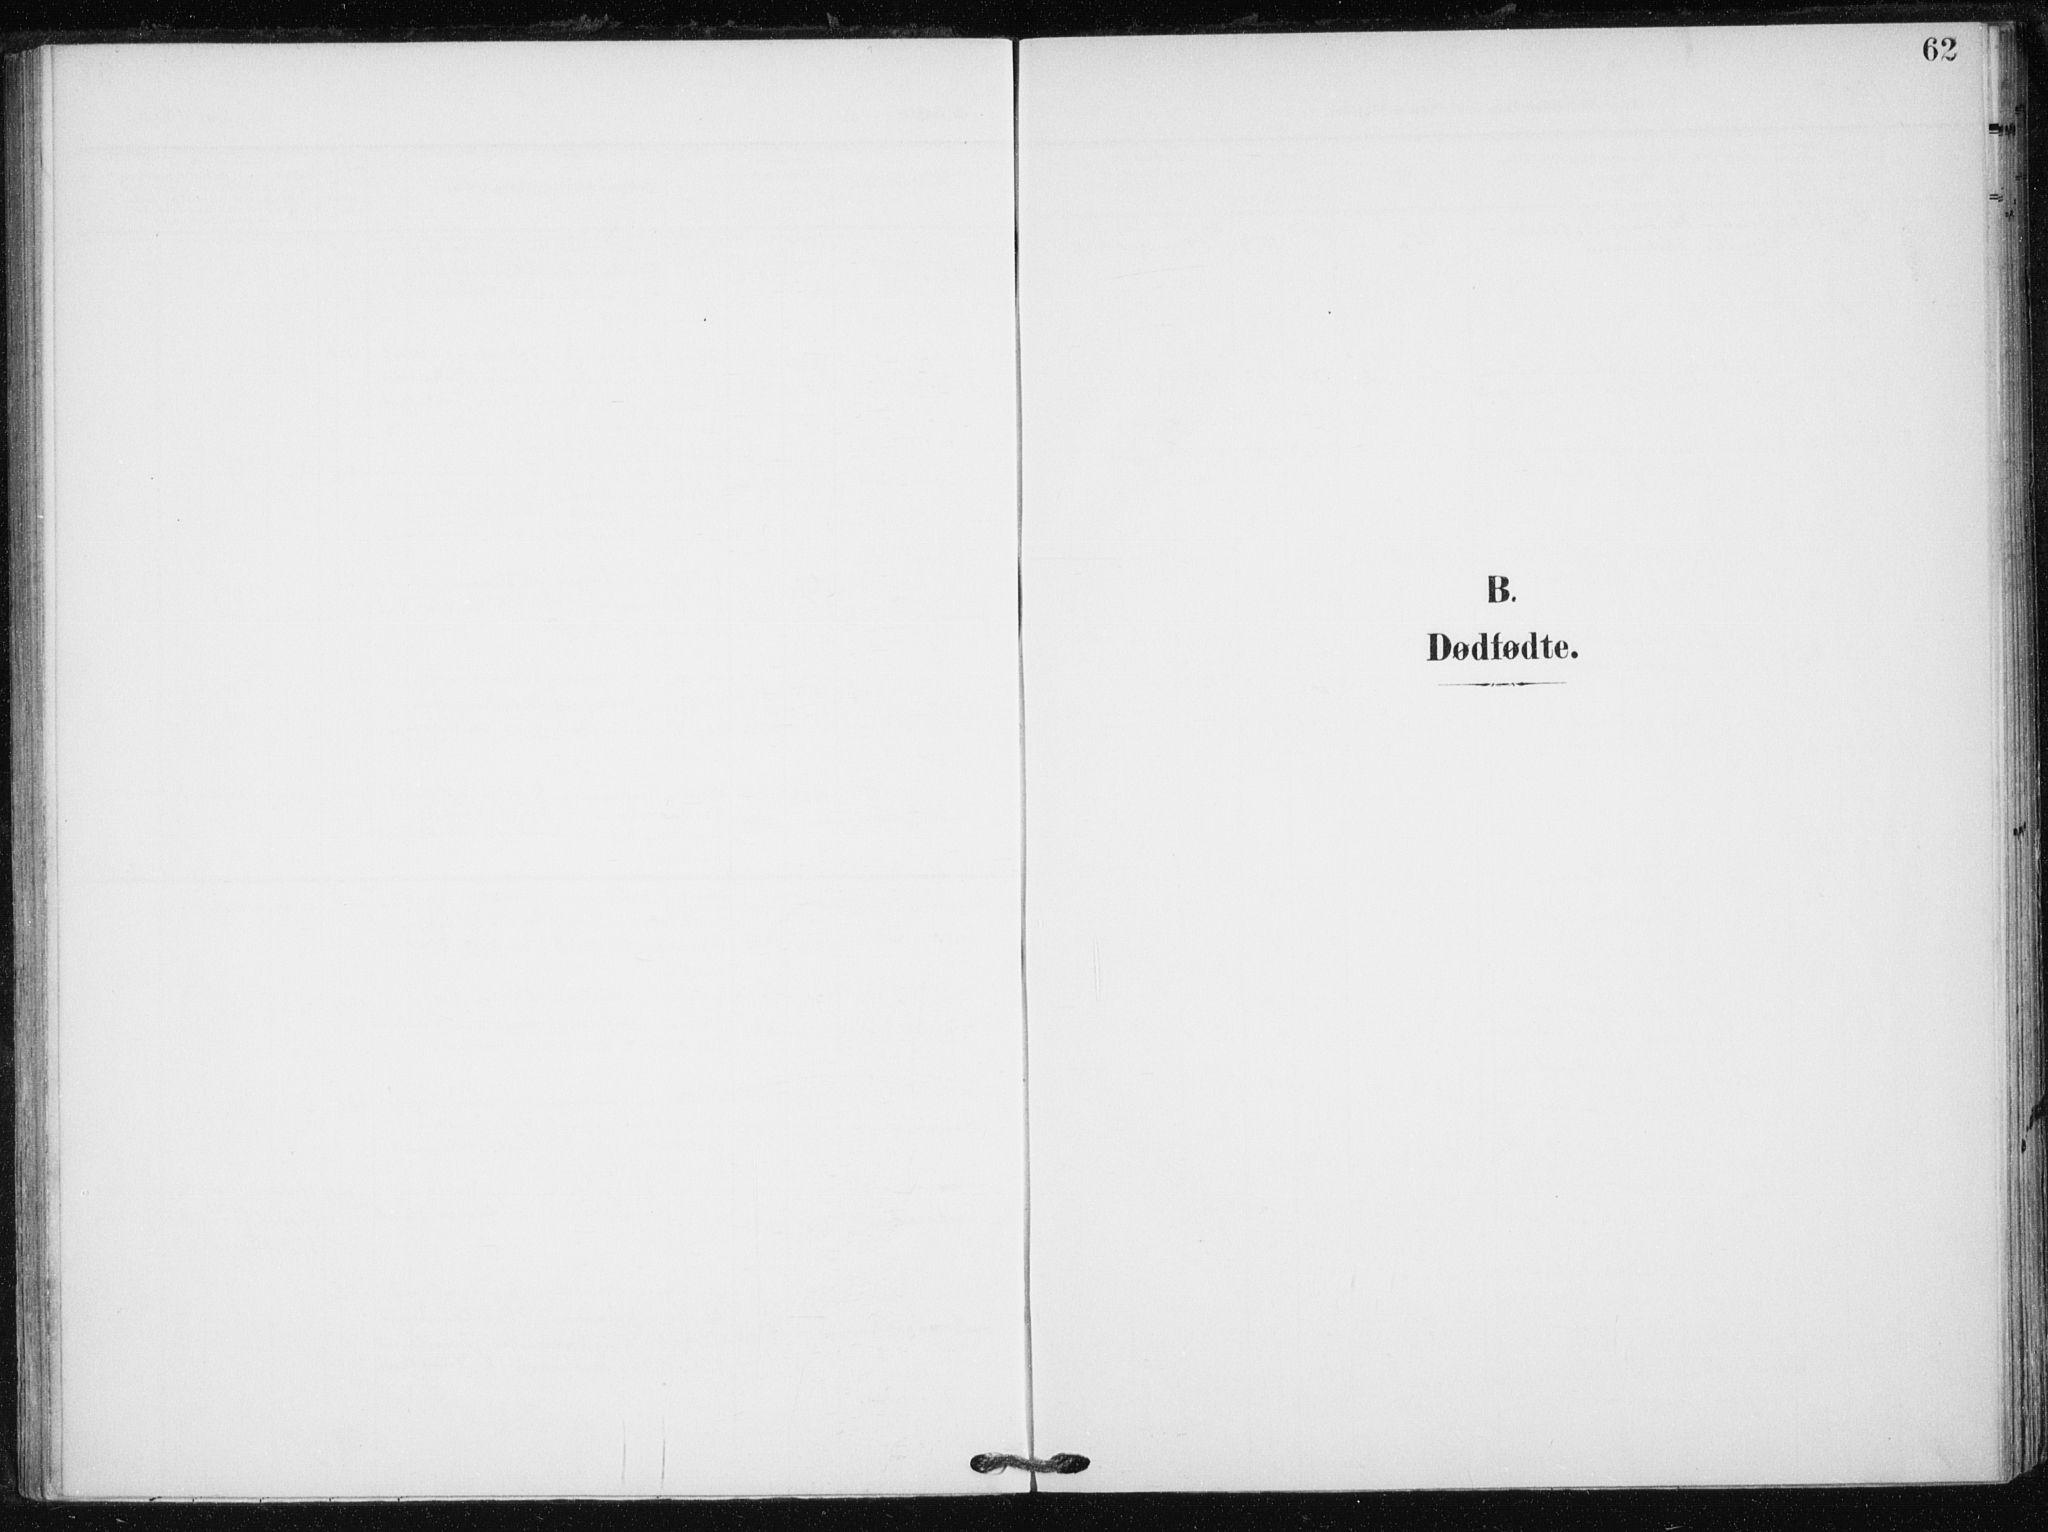 SATØ, Tranøy sokneprestkontor, I/Ia/Iaa/L0013kirke: Ministerialbok nr. 13, 1905-1922, s. 62